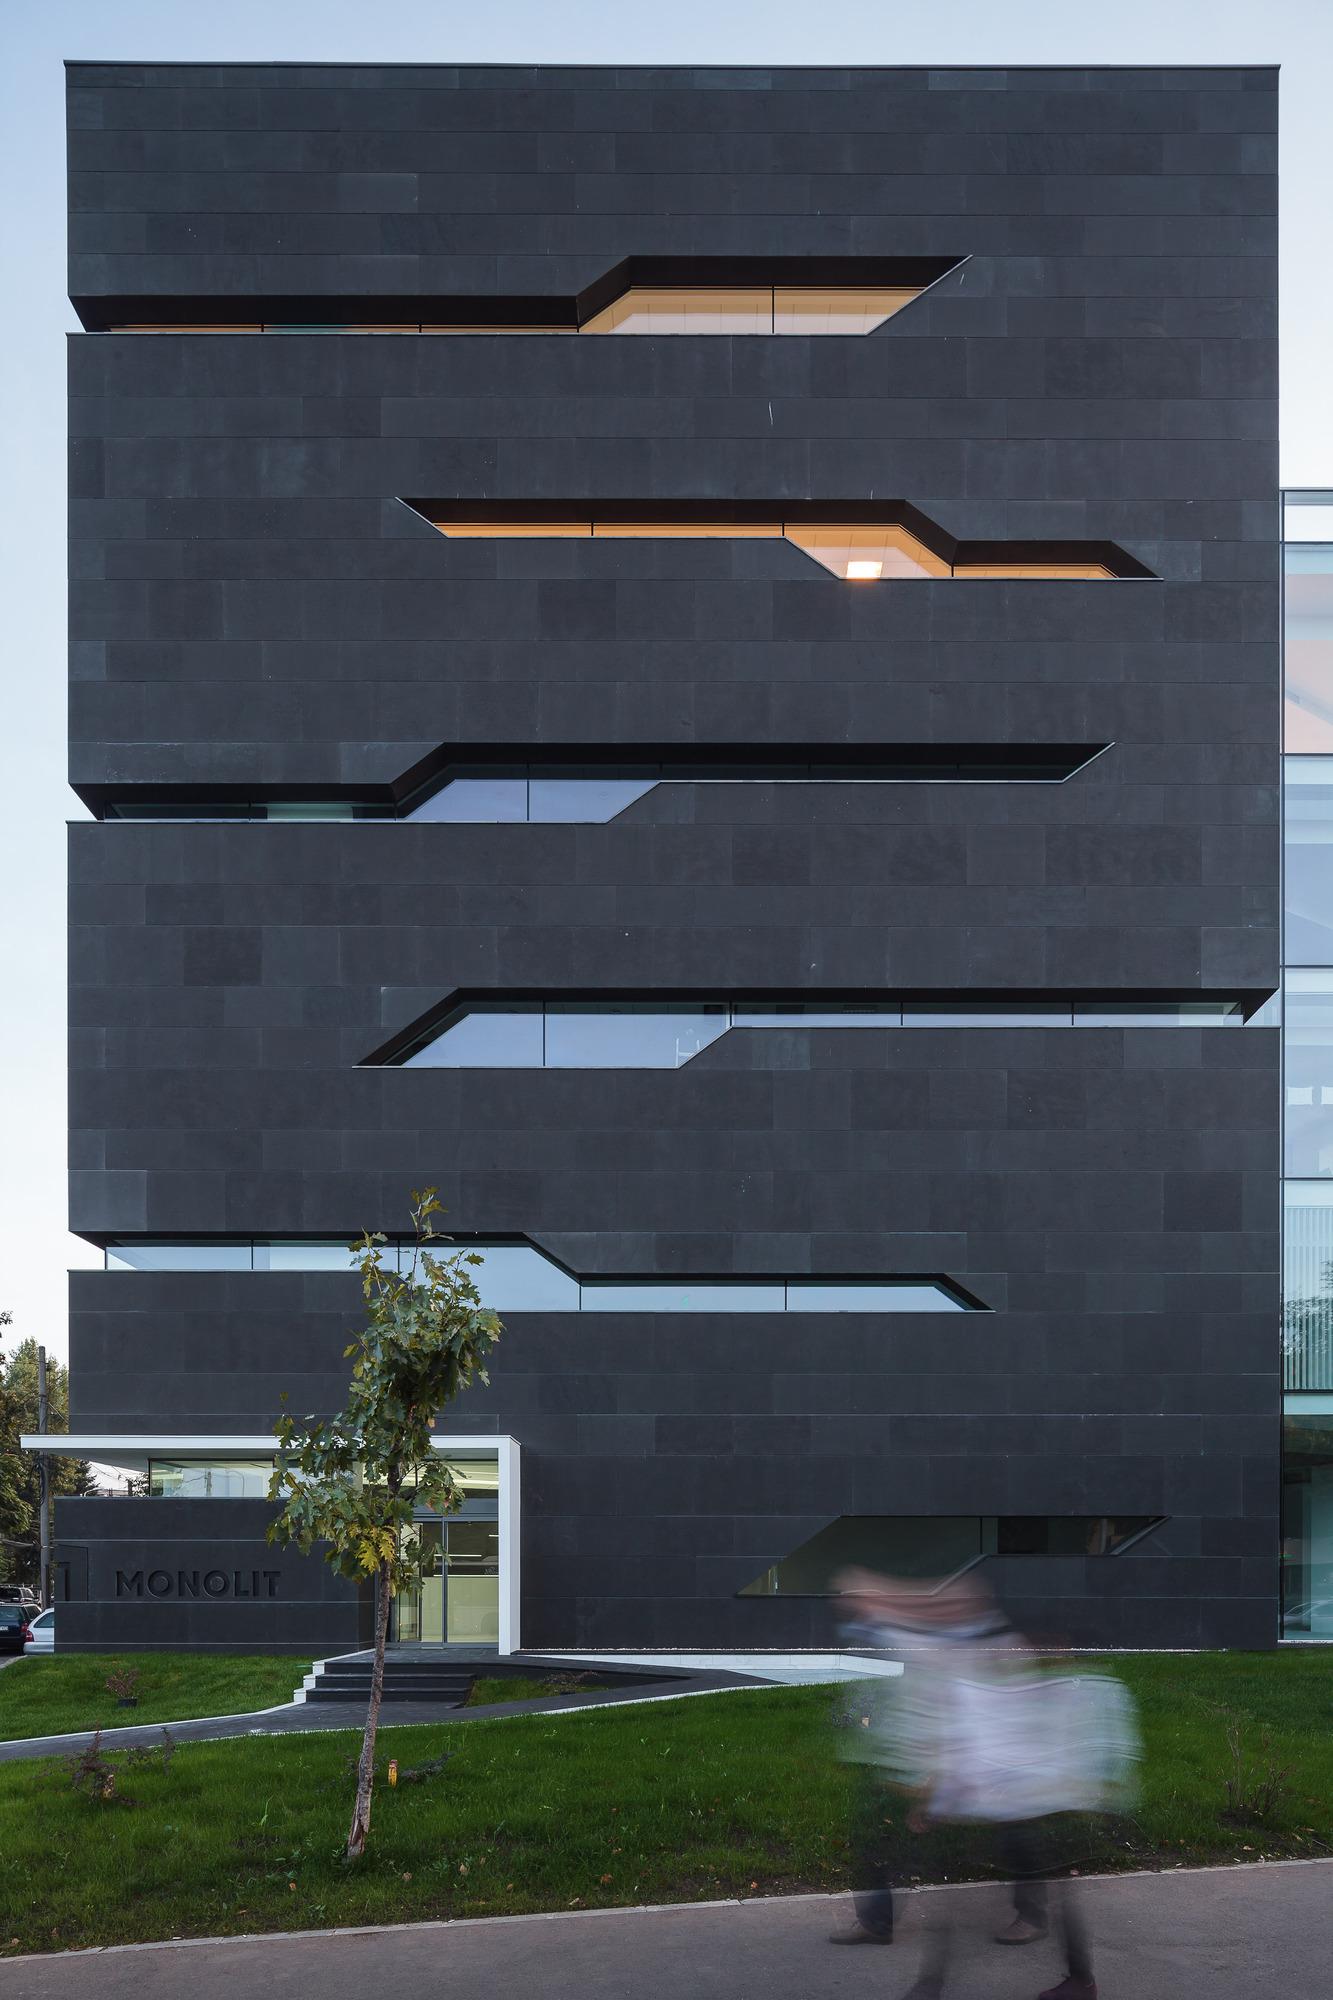 5111d4e8b3fc4bae40000025_monolit-office-building-igloo-architecture_cdragomir_monolit_024